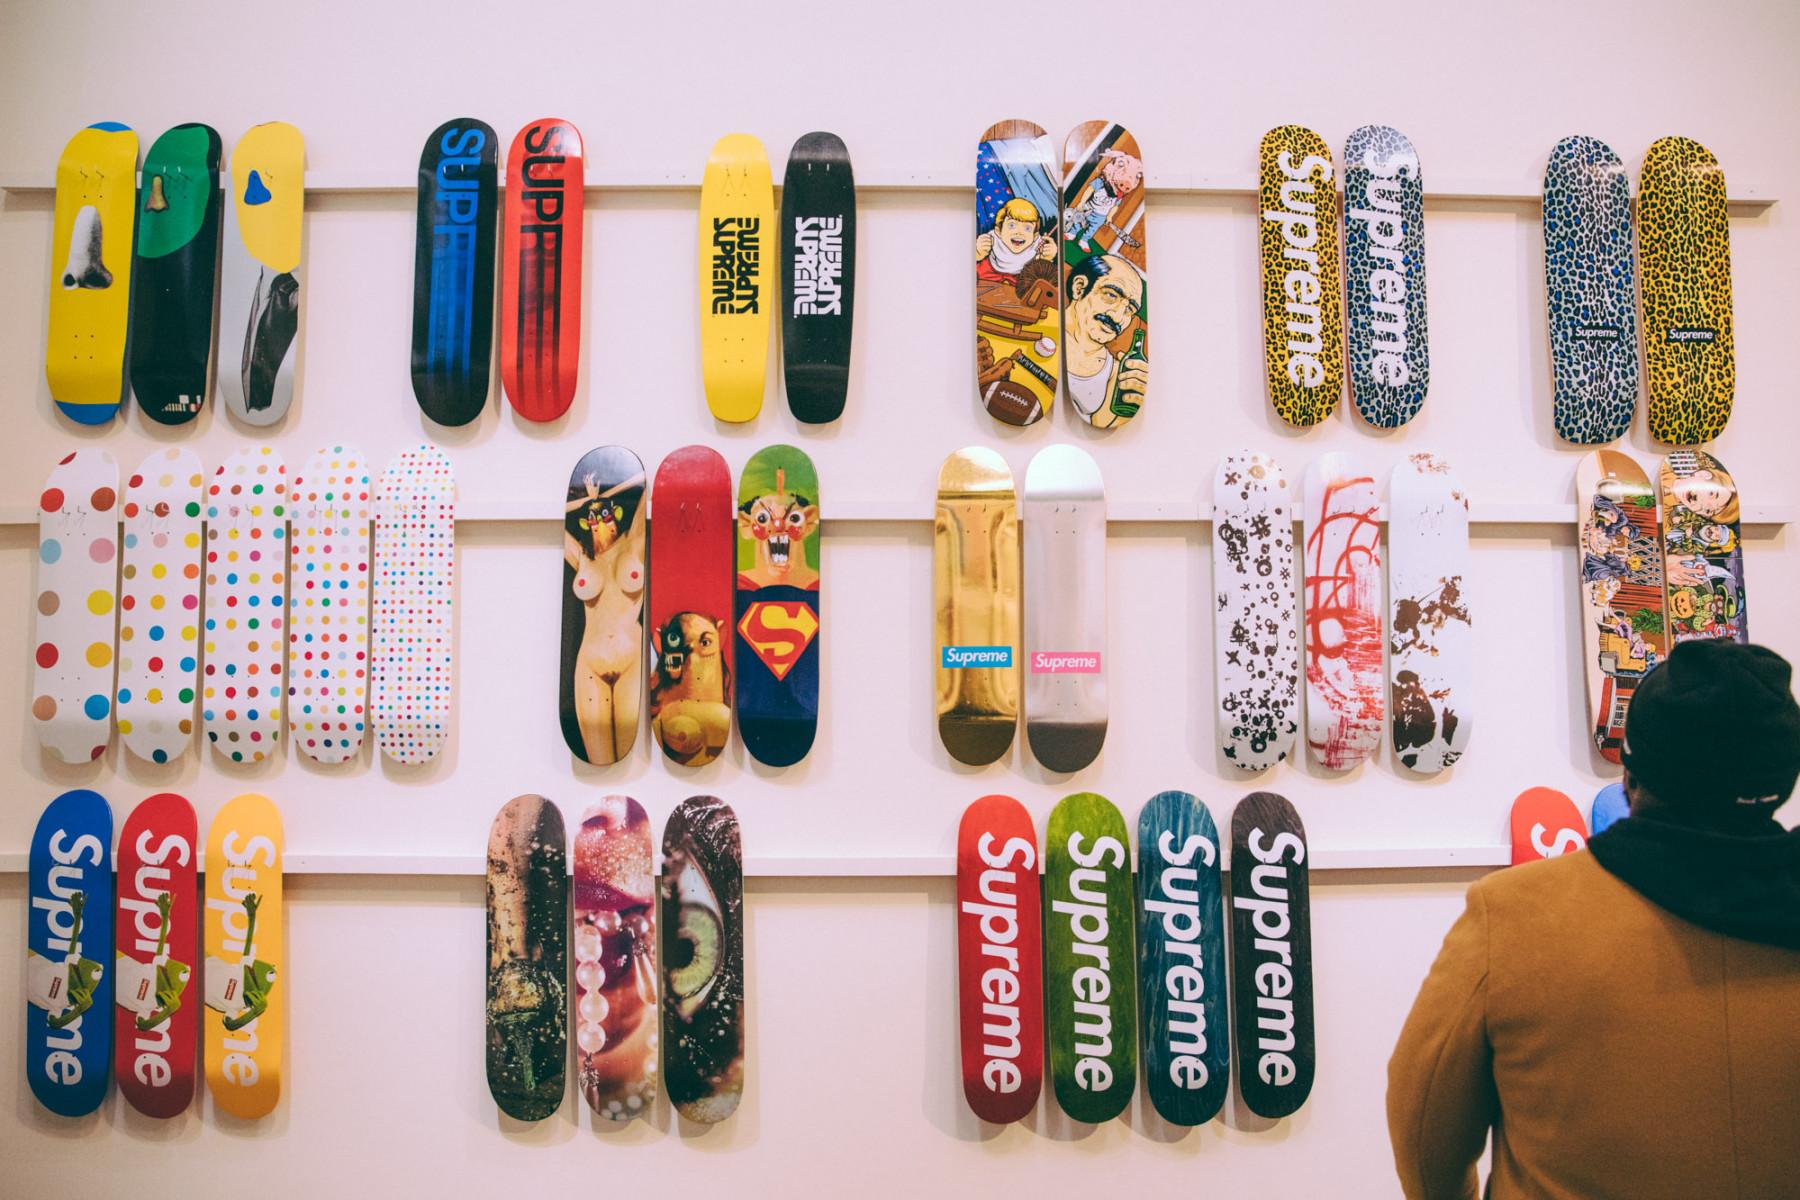 Sothebys-Supreme-Skate-Decks-20-1800x1200